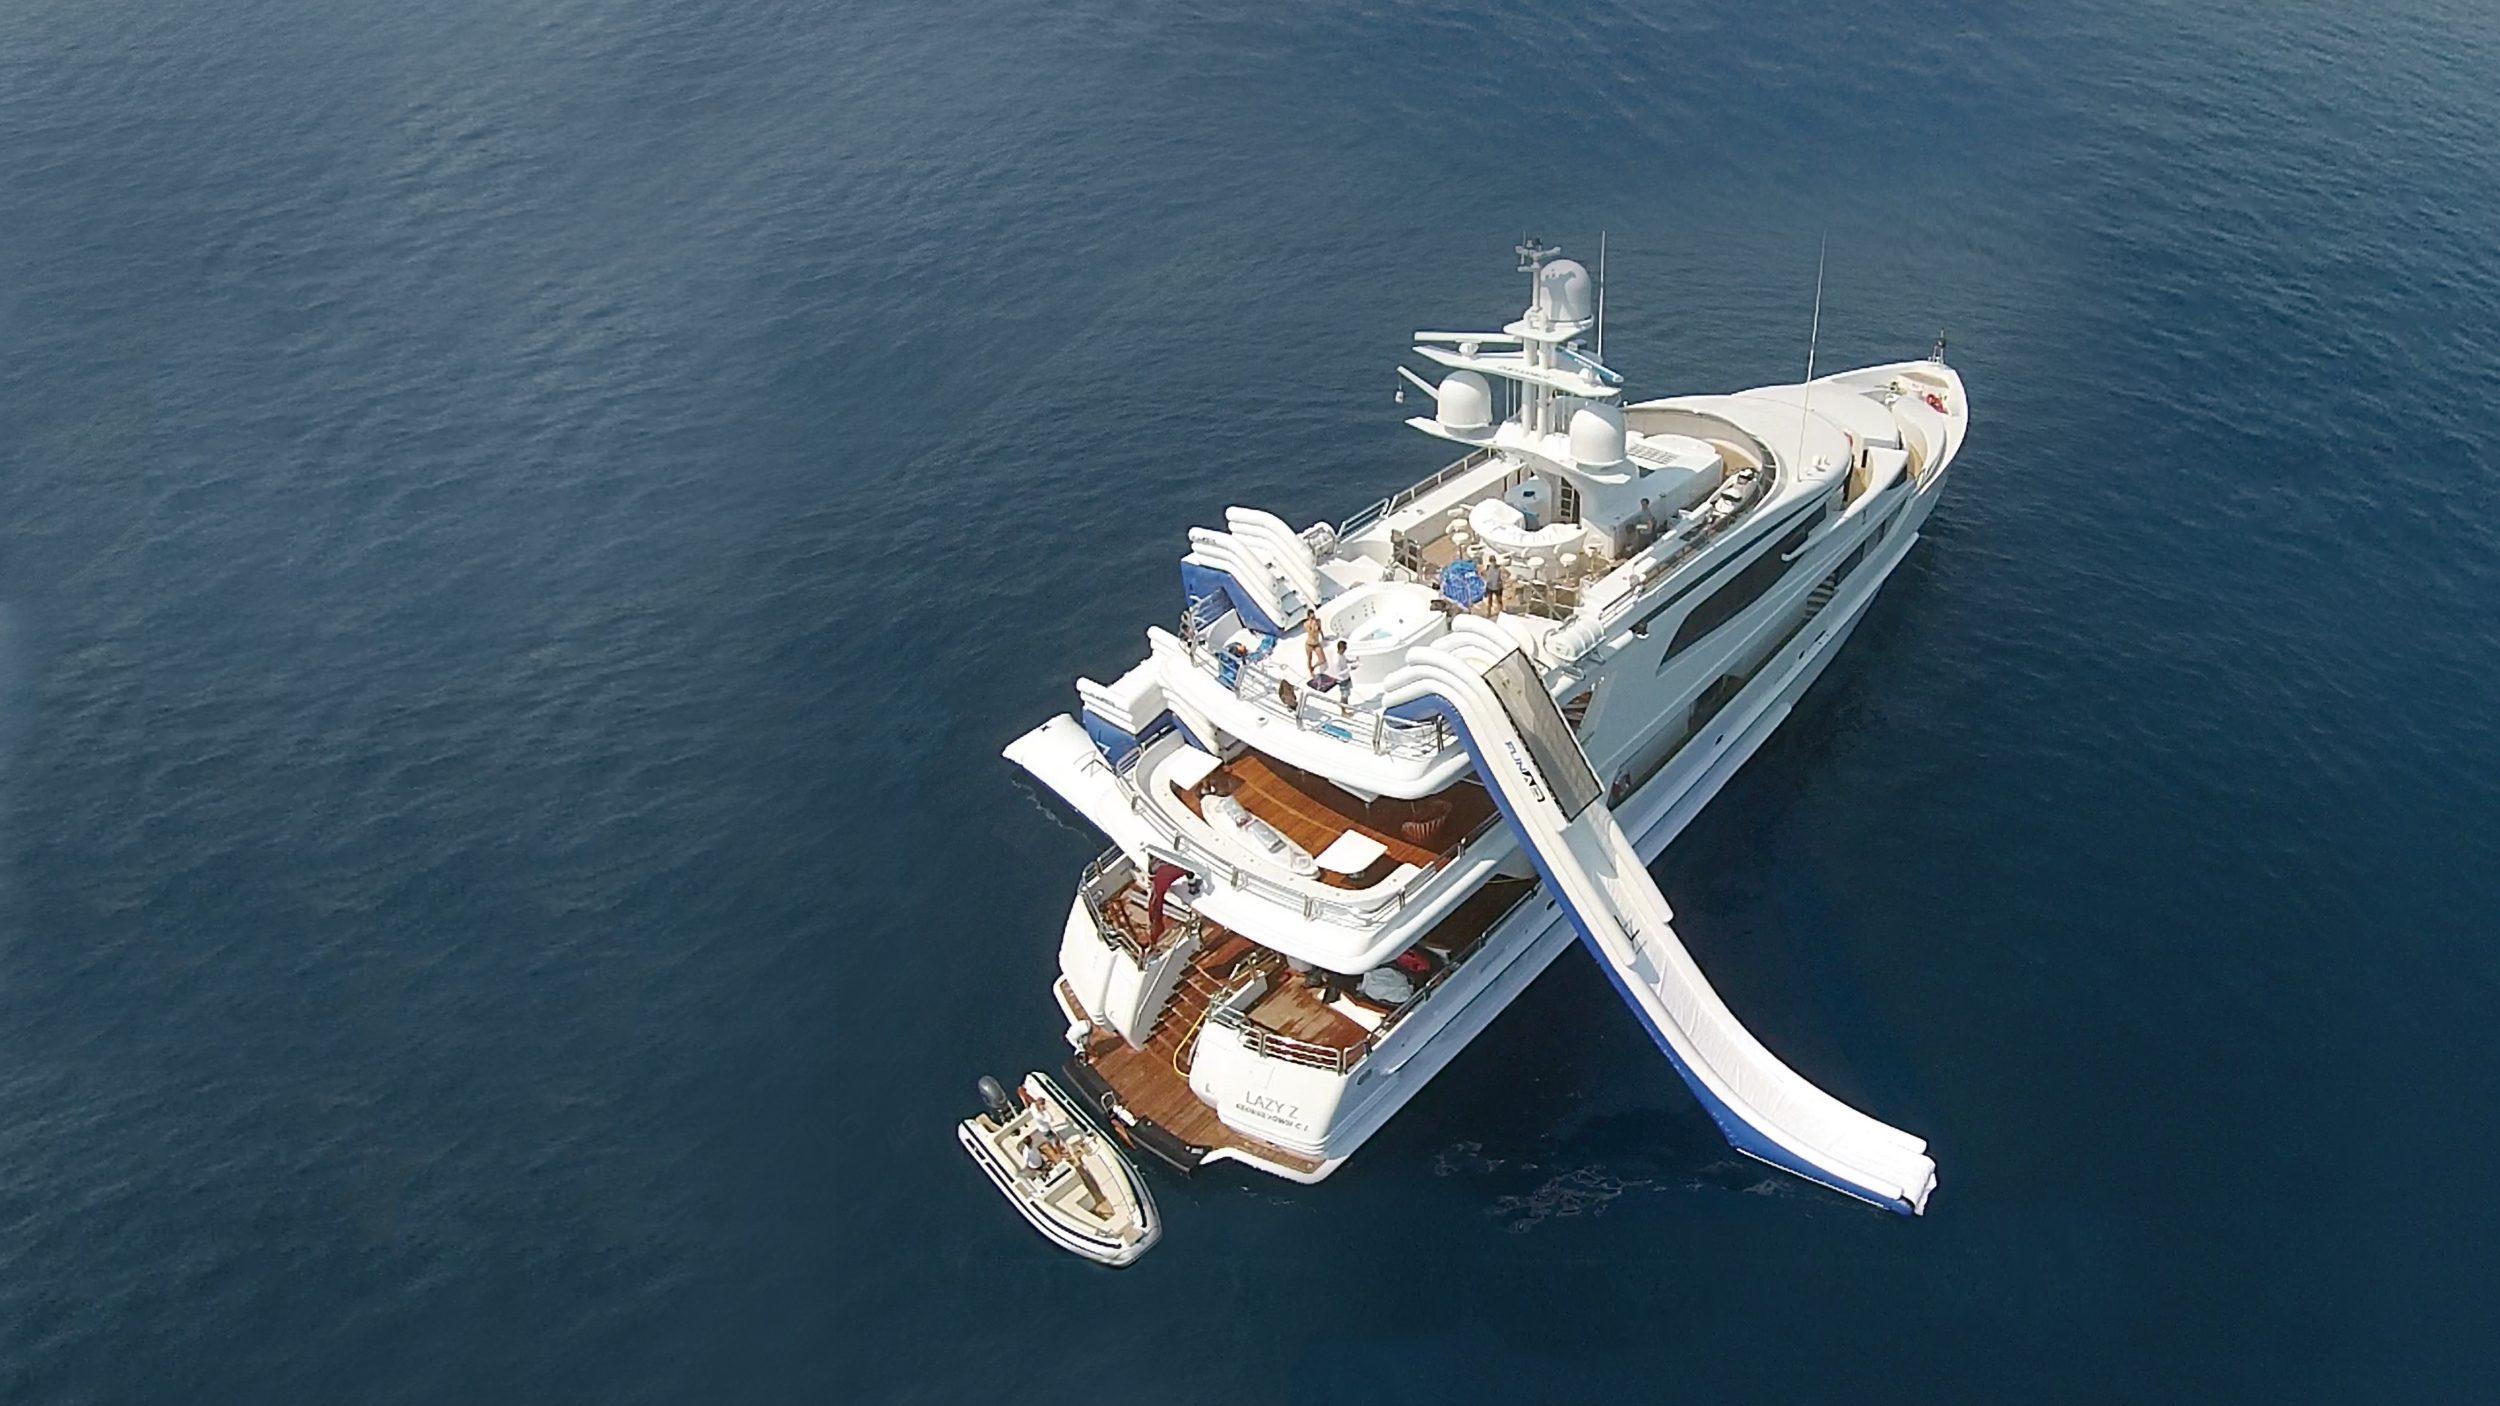 Yacht jump platform